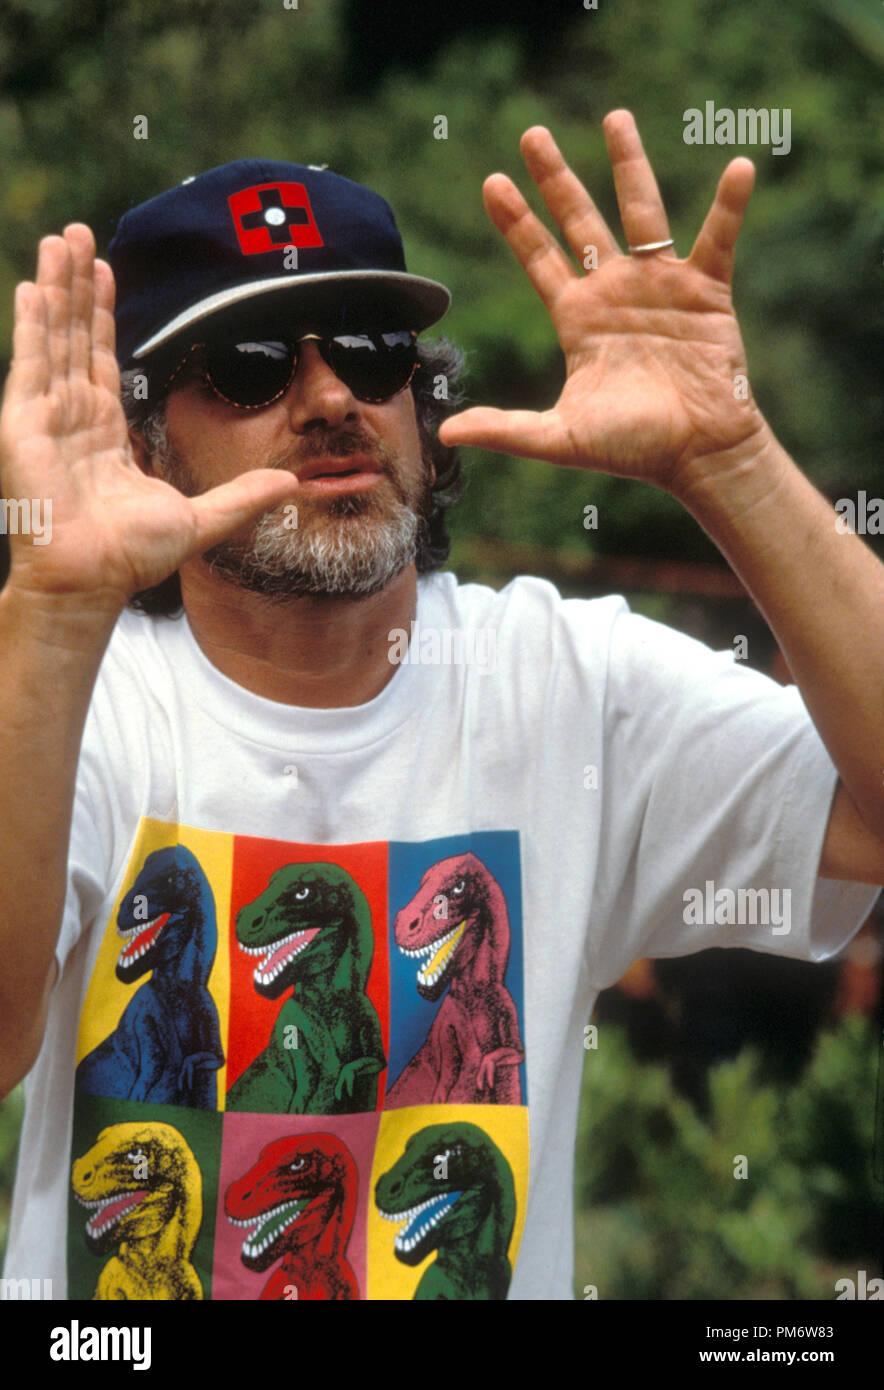 Film Still from 'Jurassic Park' Director Steven Spielberg © 1993 Universal Photo Credit: Murray Close - Stock Image